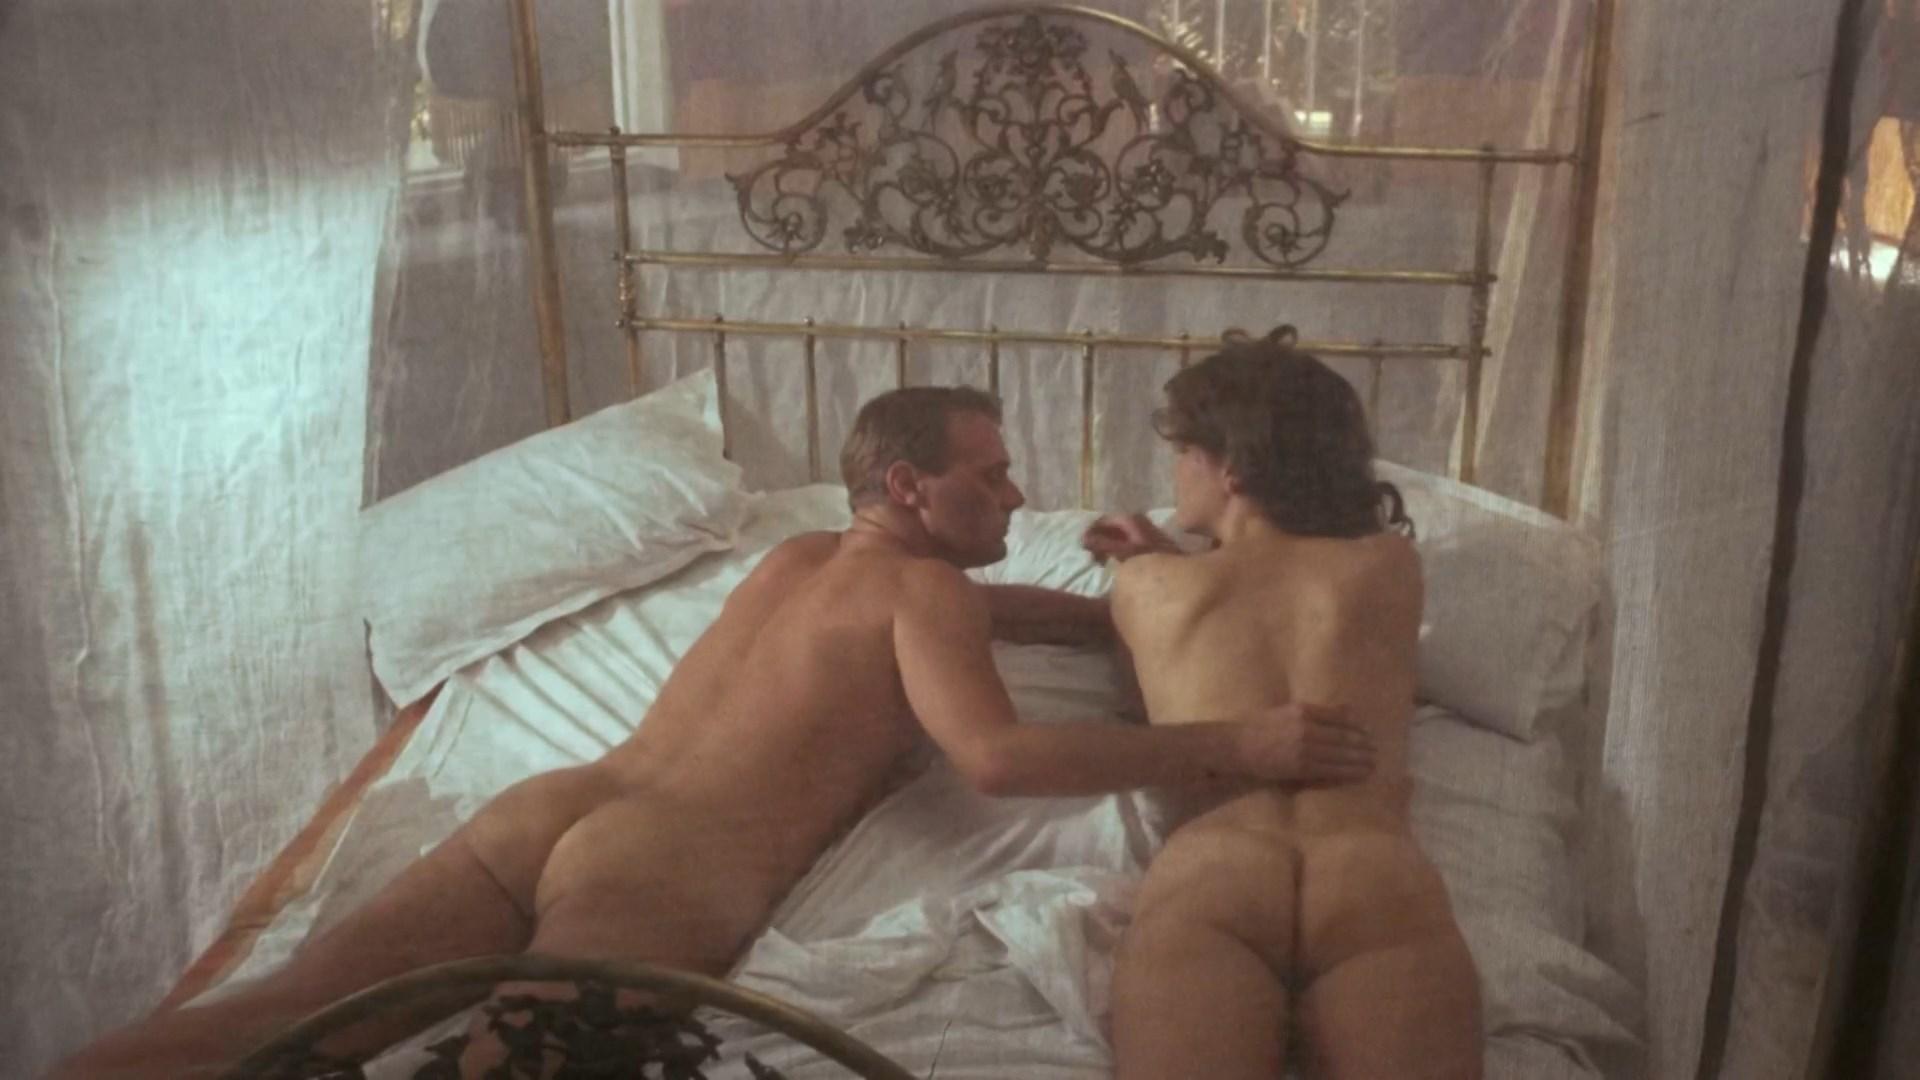 Nude Video Celebs  Greta Scacchi Nude - Heat And Dust 1983-9178